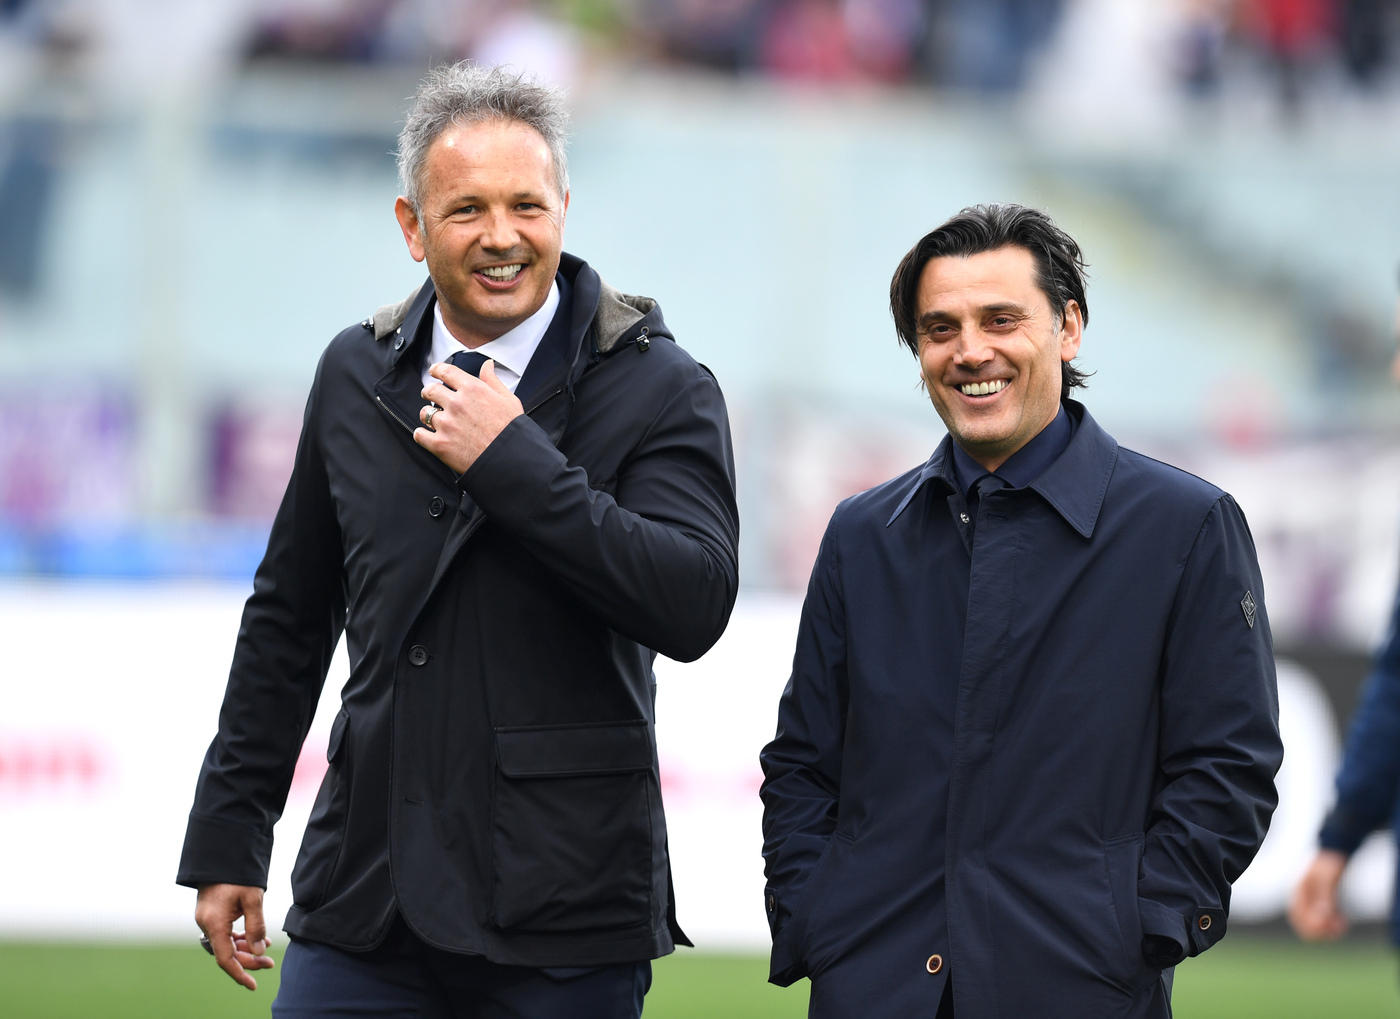 Tra Fiorentina e Bologna pareggio senza gol<br /><br />